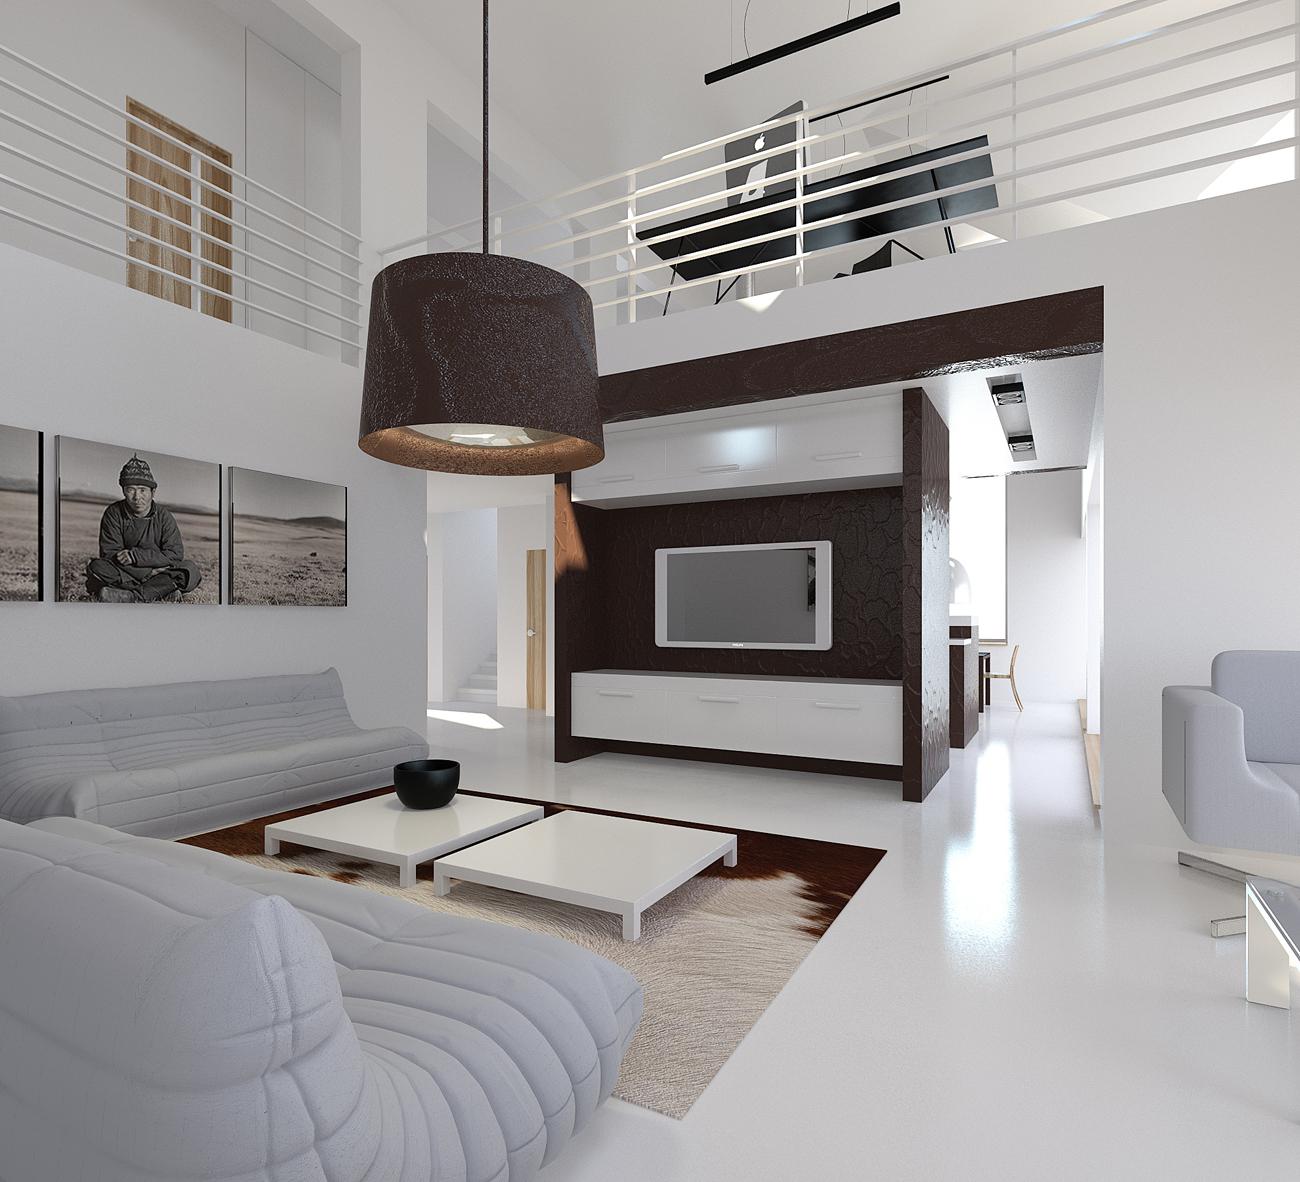 Interior design house design interior design house ideas fair new house furnishing ideas GMYHEND